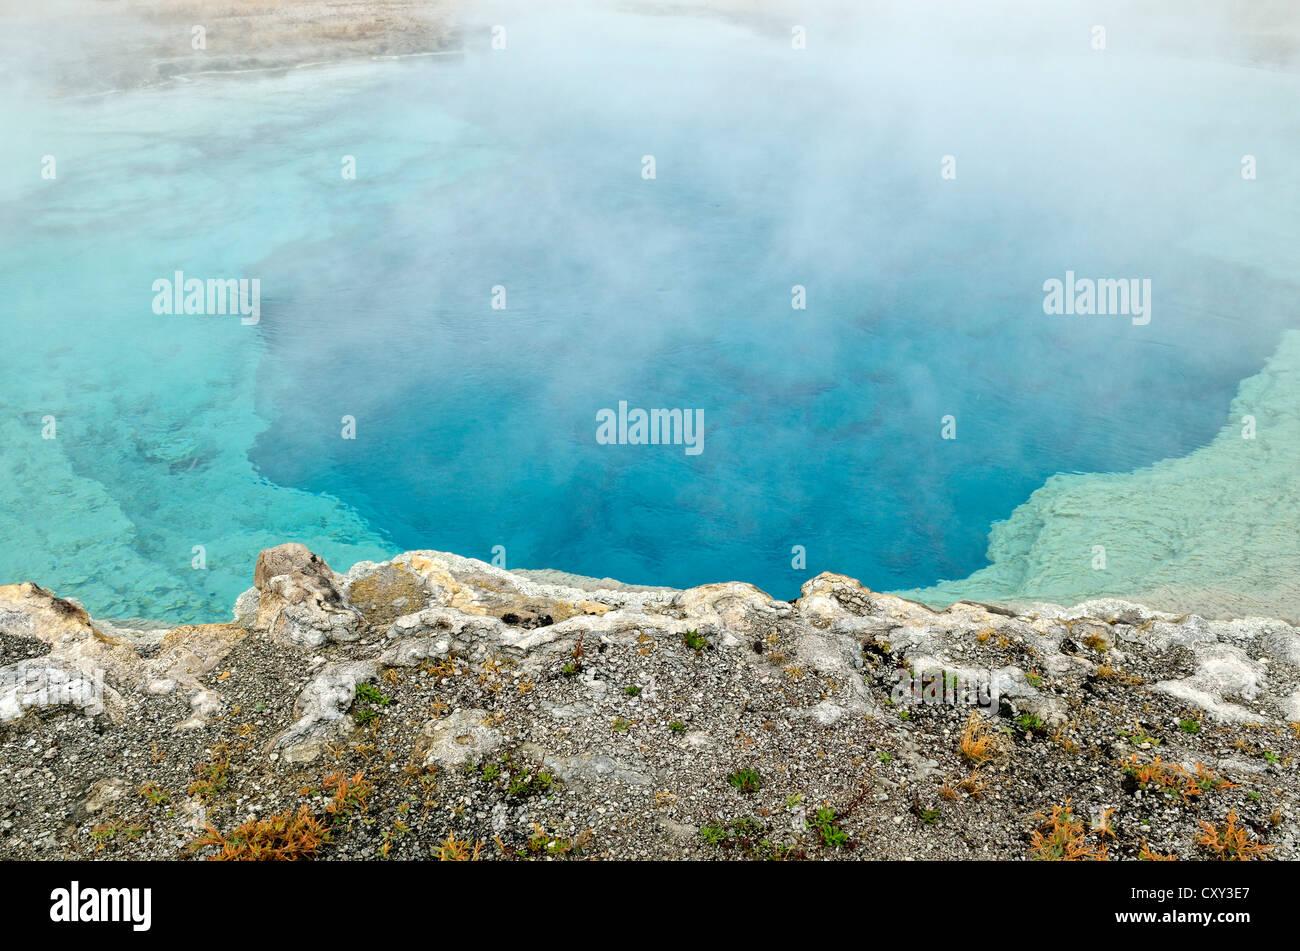 Piscina Sapphire, Biscuit Basin, el Parque Nacional Yellowstone, Wyoming, EE.UU. Foto de stock